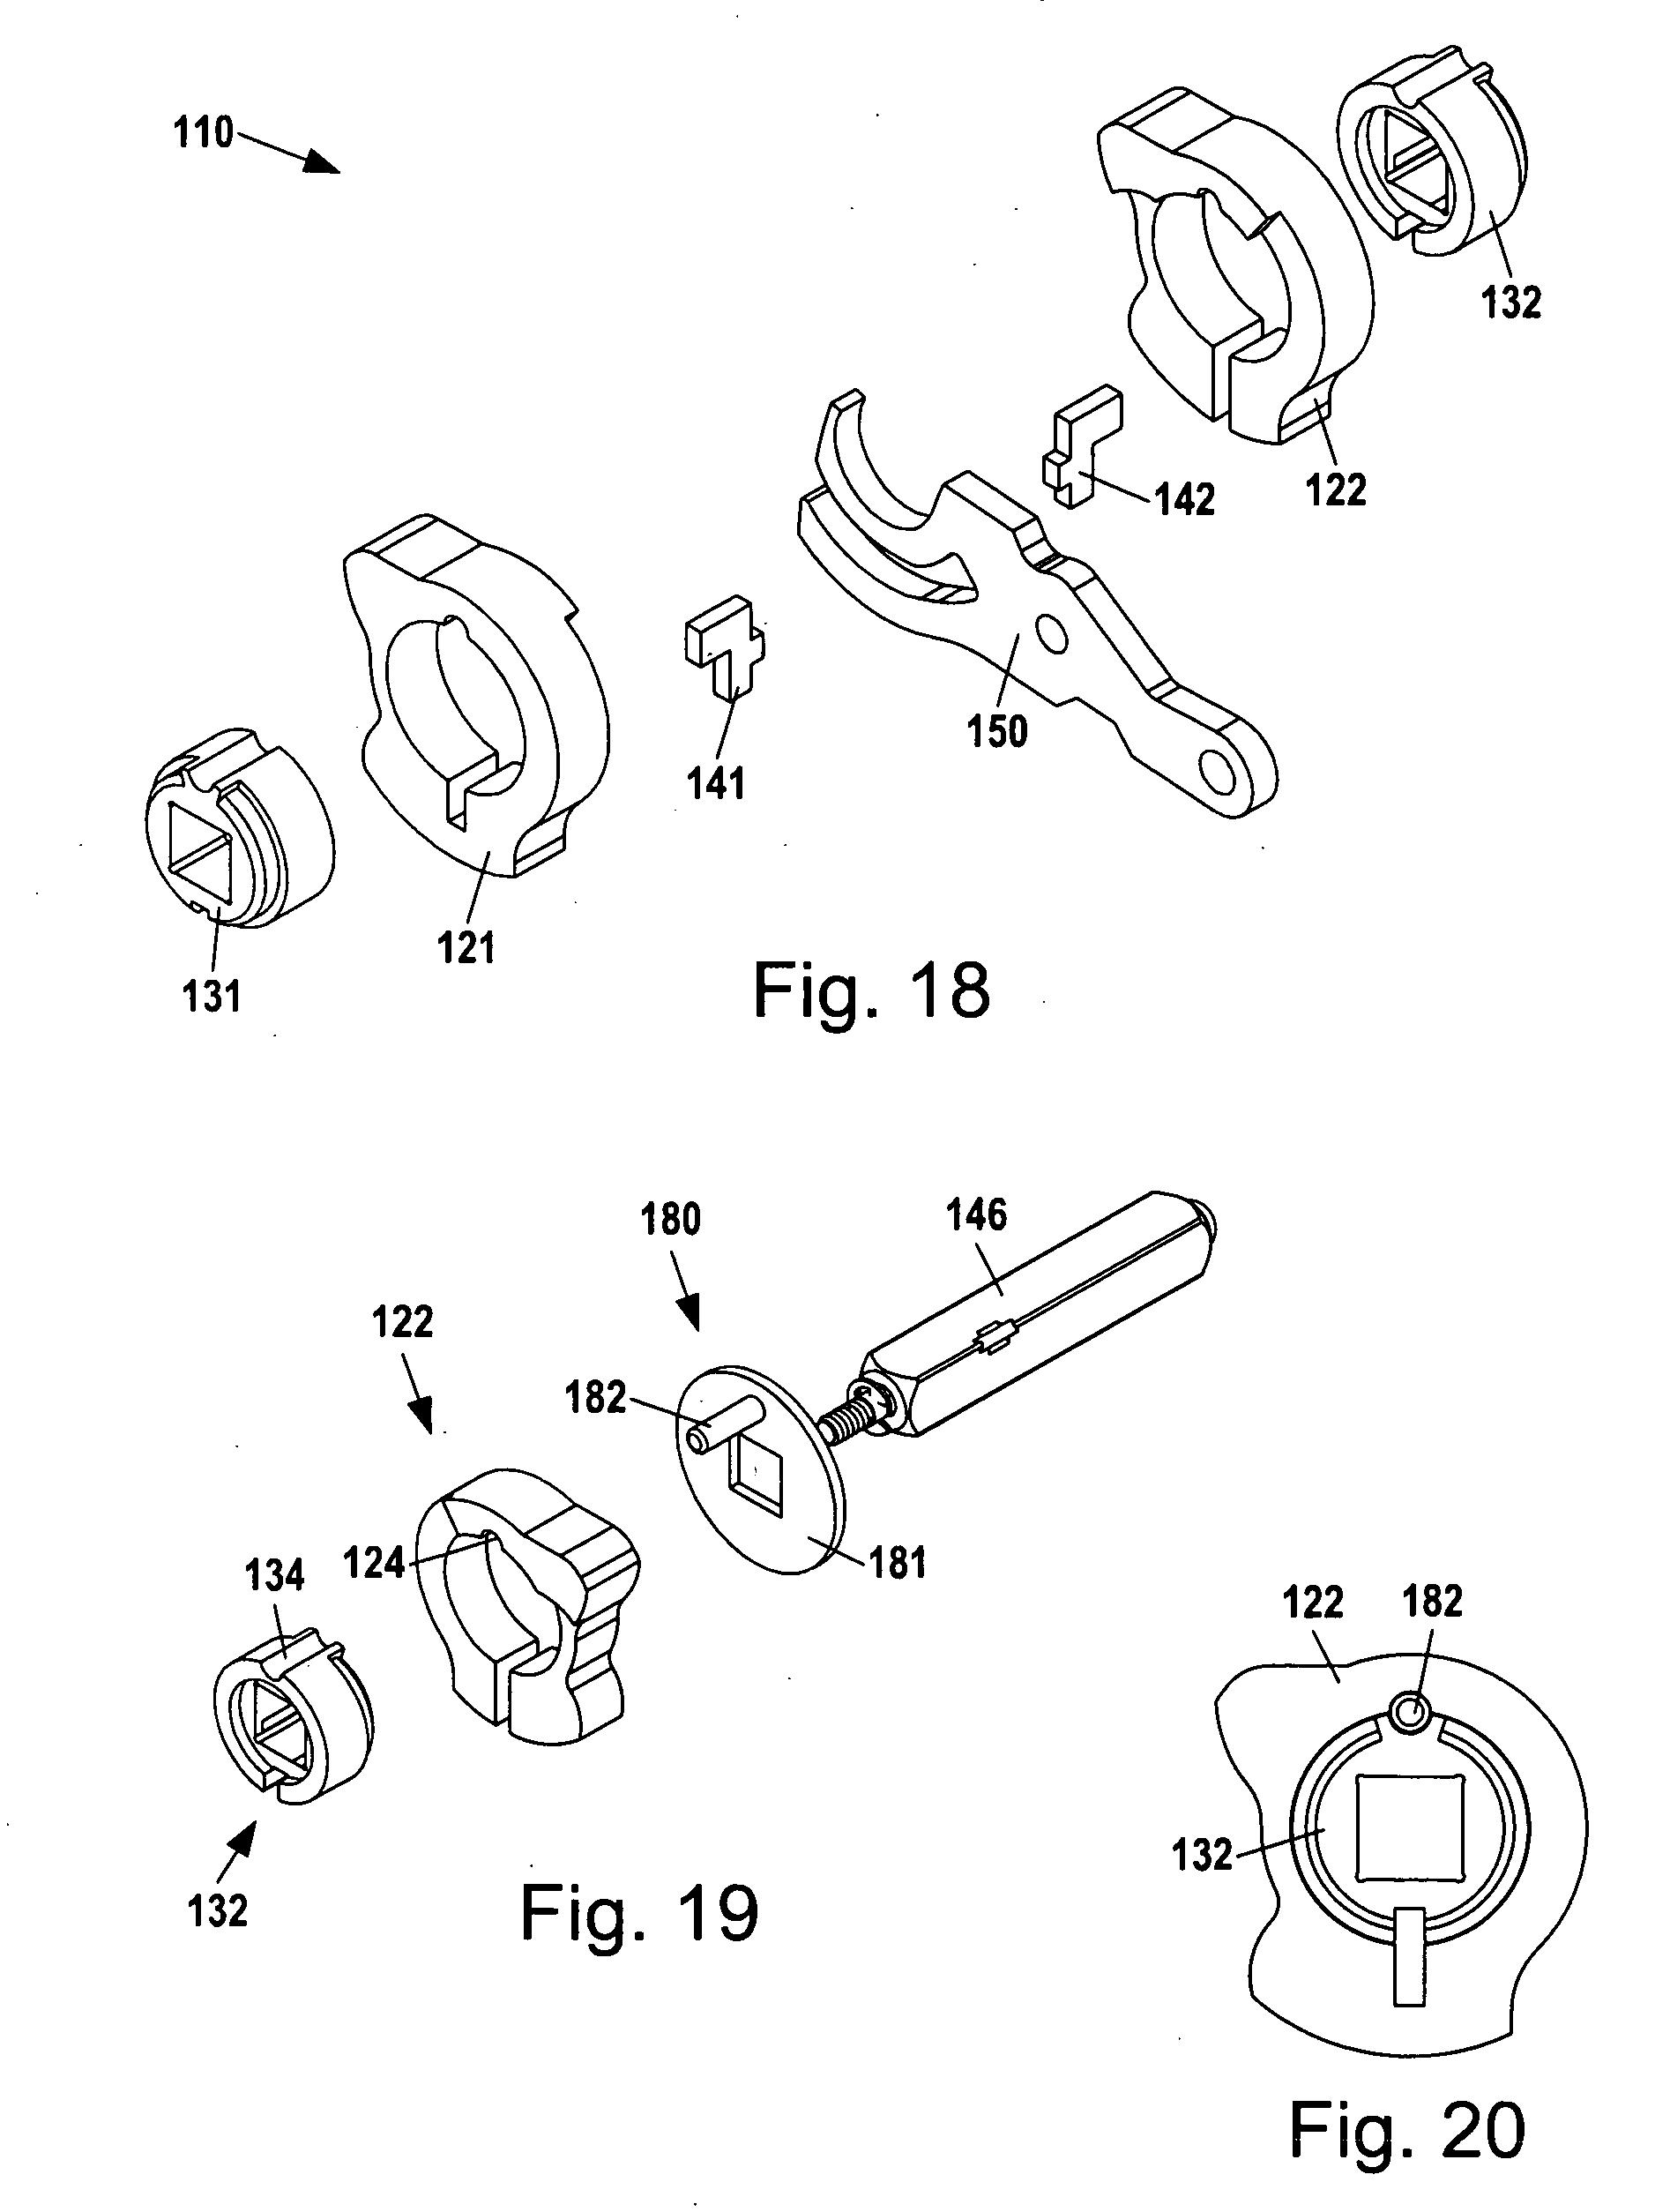 How Kwikset Locks Work Diagram, How, Free Engine Image For